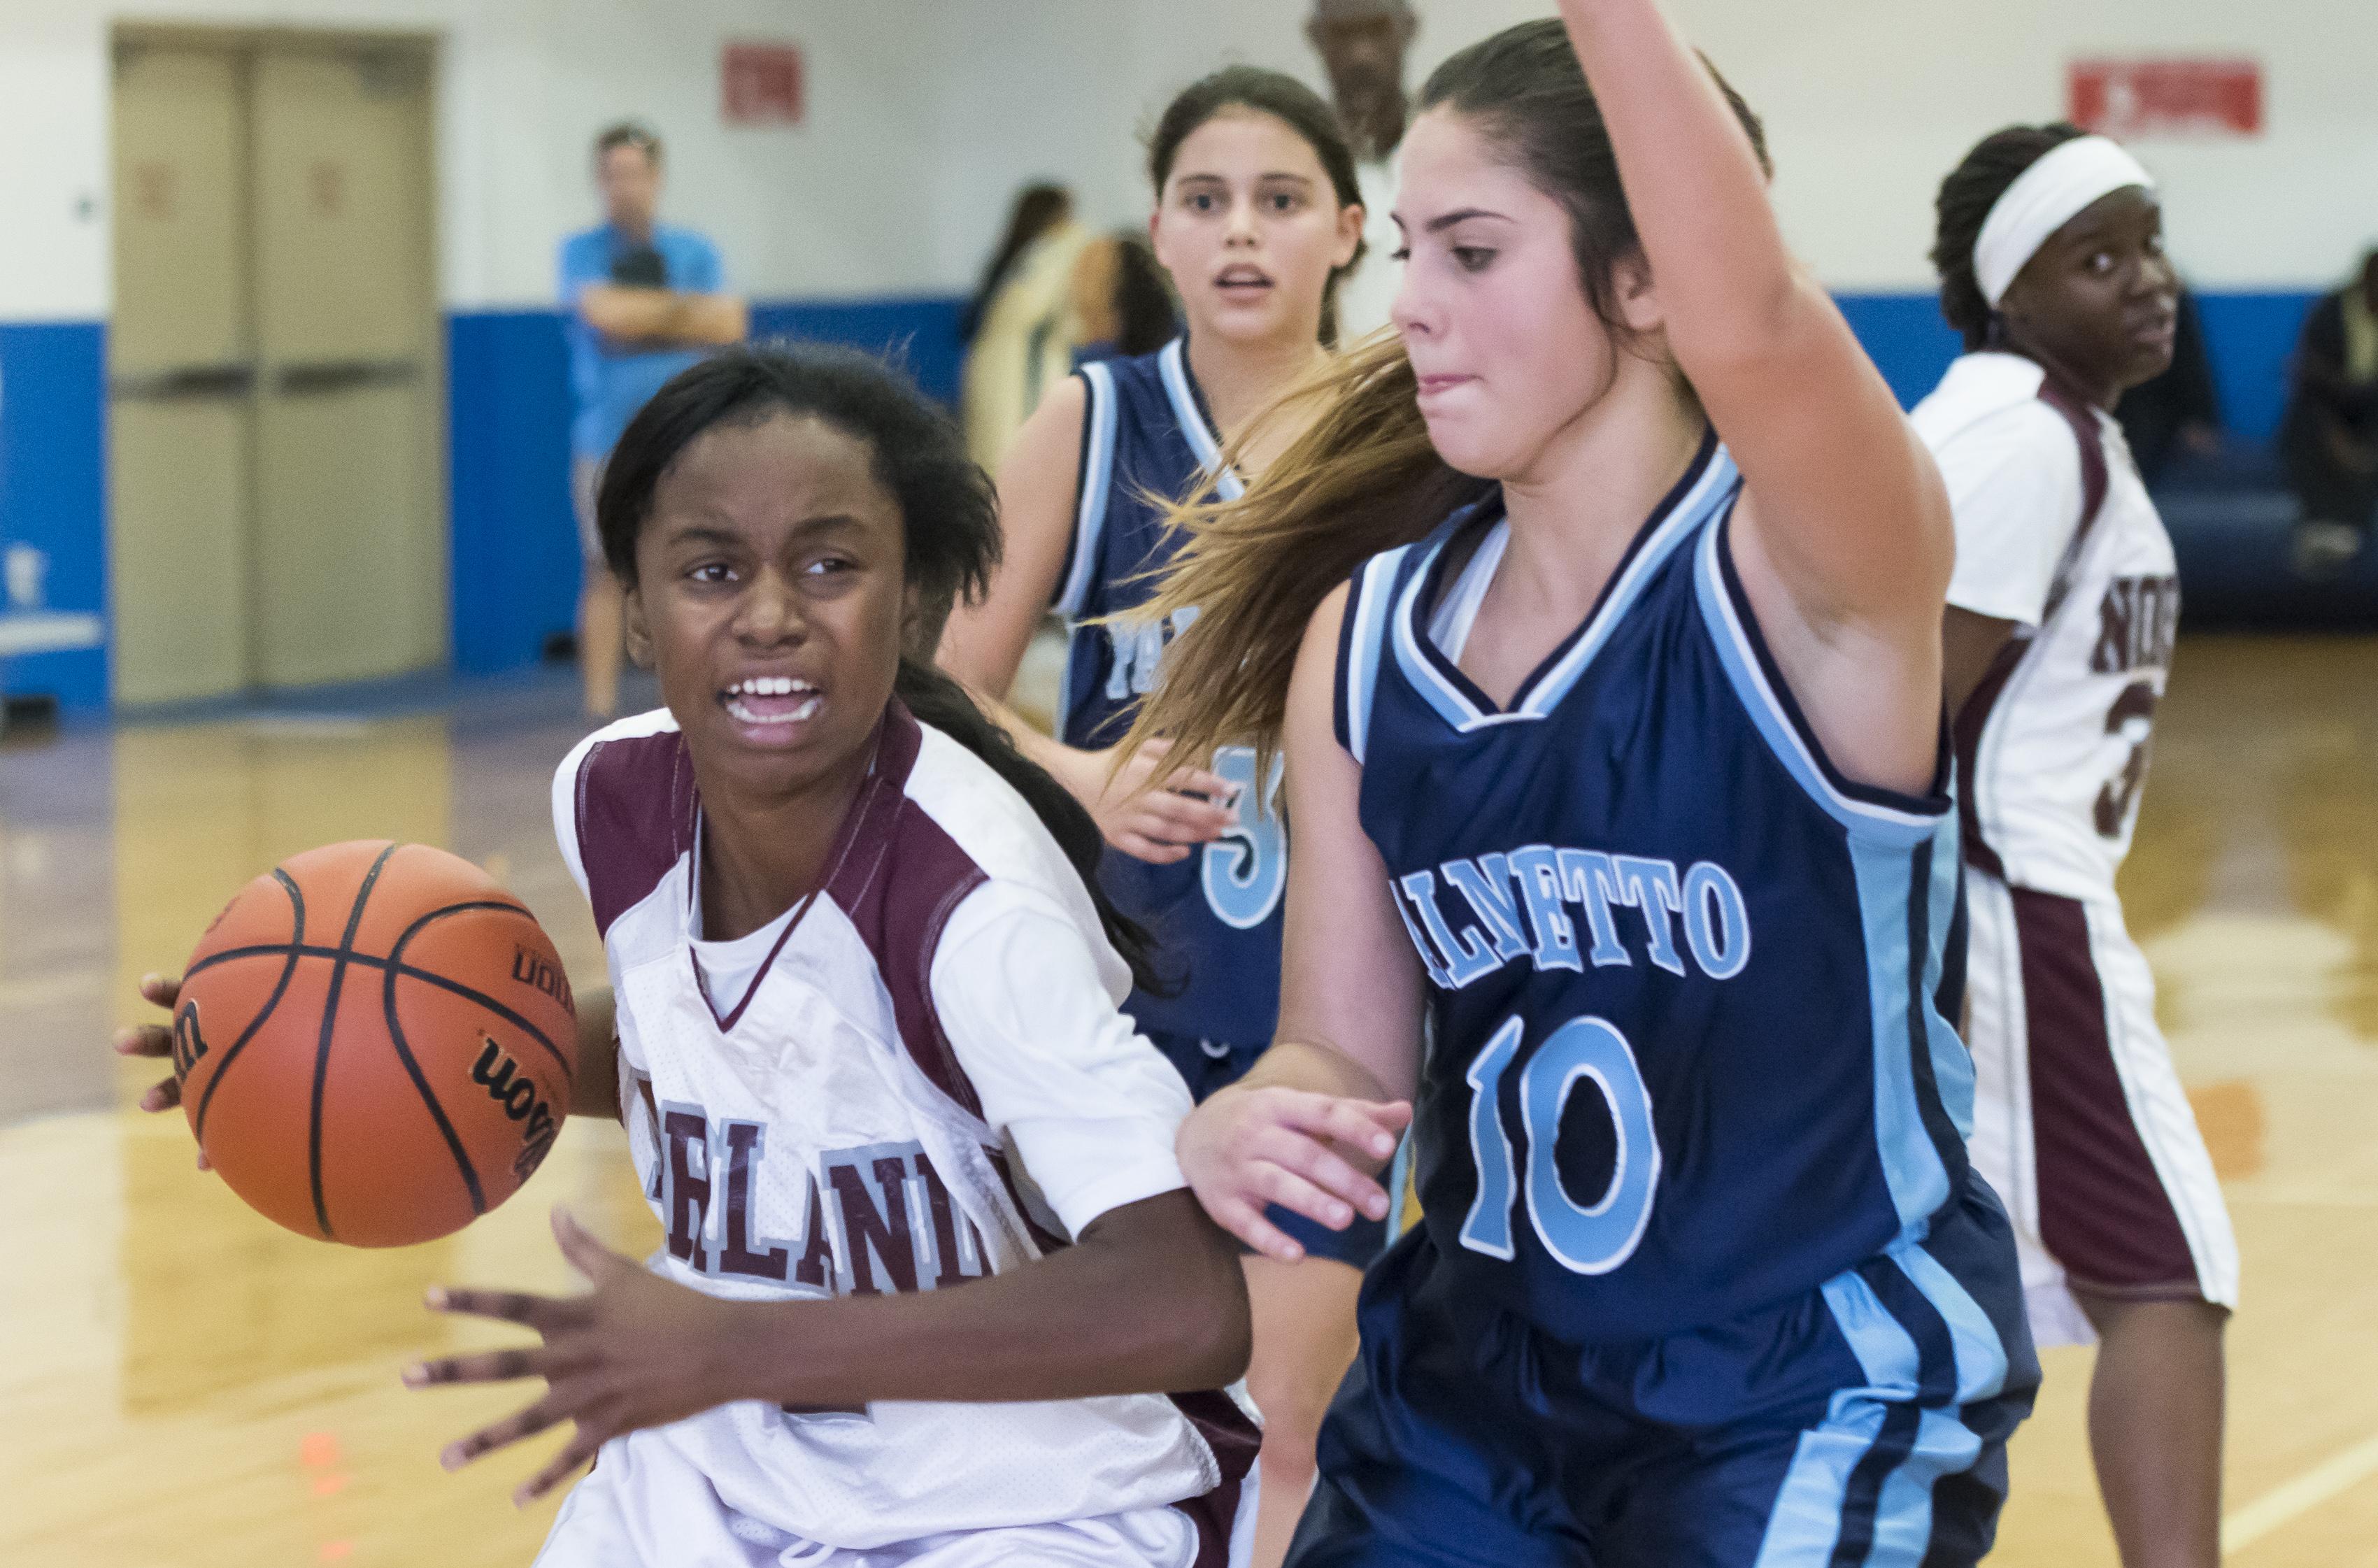 Girls' Middle School Basketball